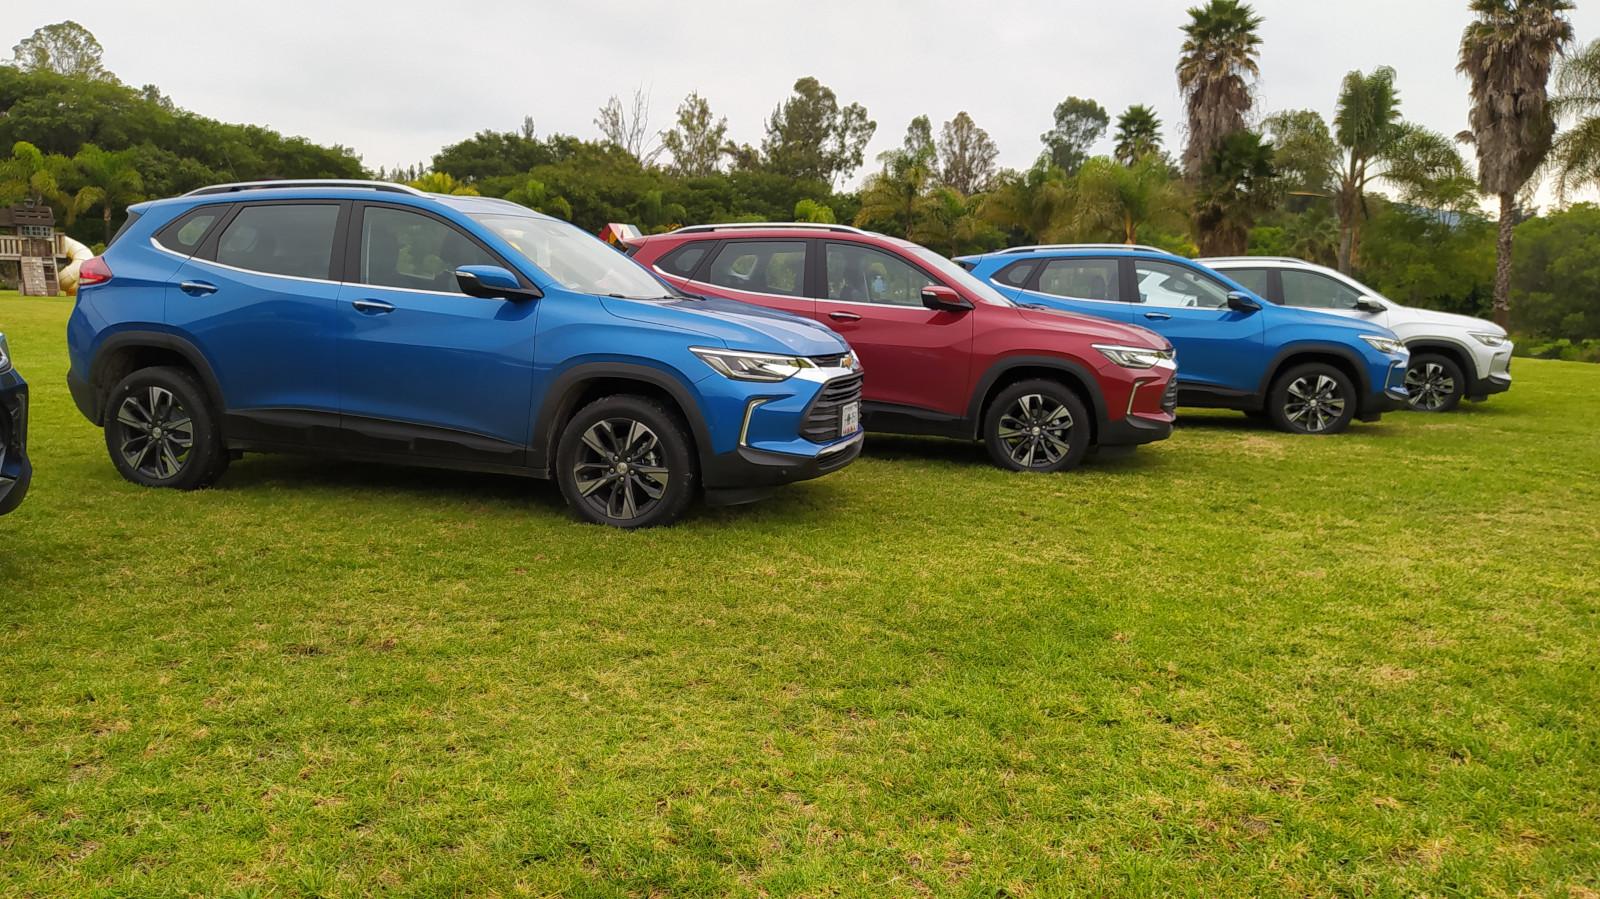 Un viaje diferente con Chevrolet Tracker 2021